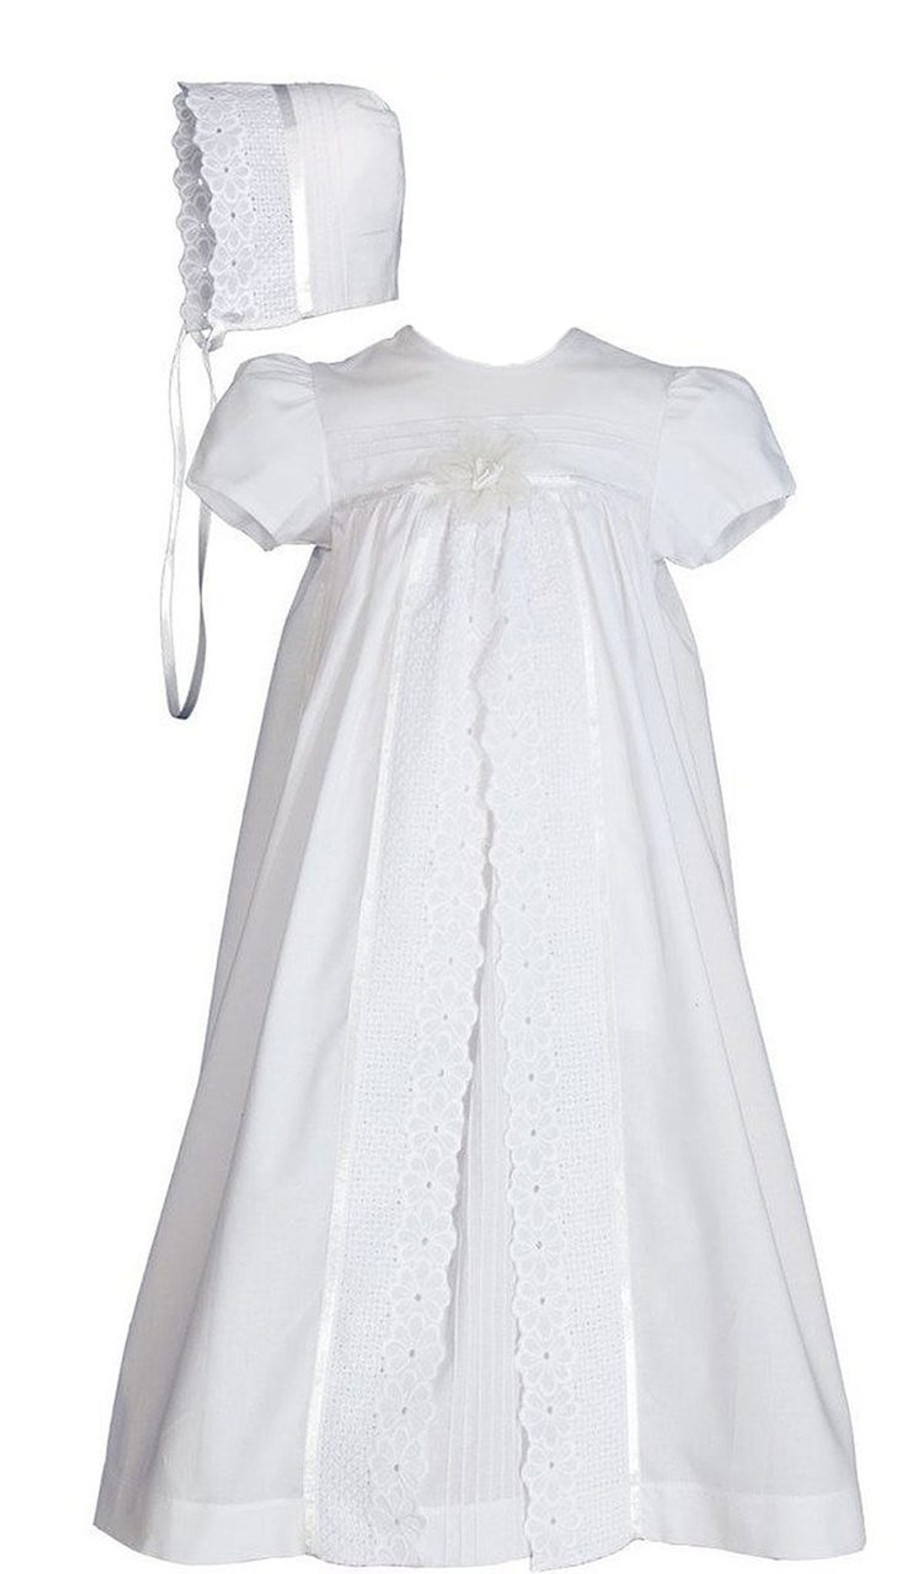 Girls 25″ Split Panel Cotton Dress Christening Gown Baptism Gown